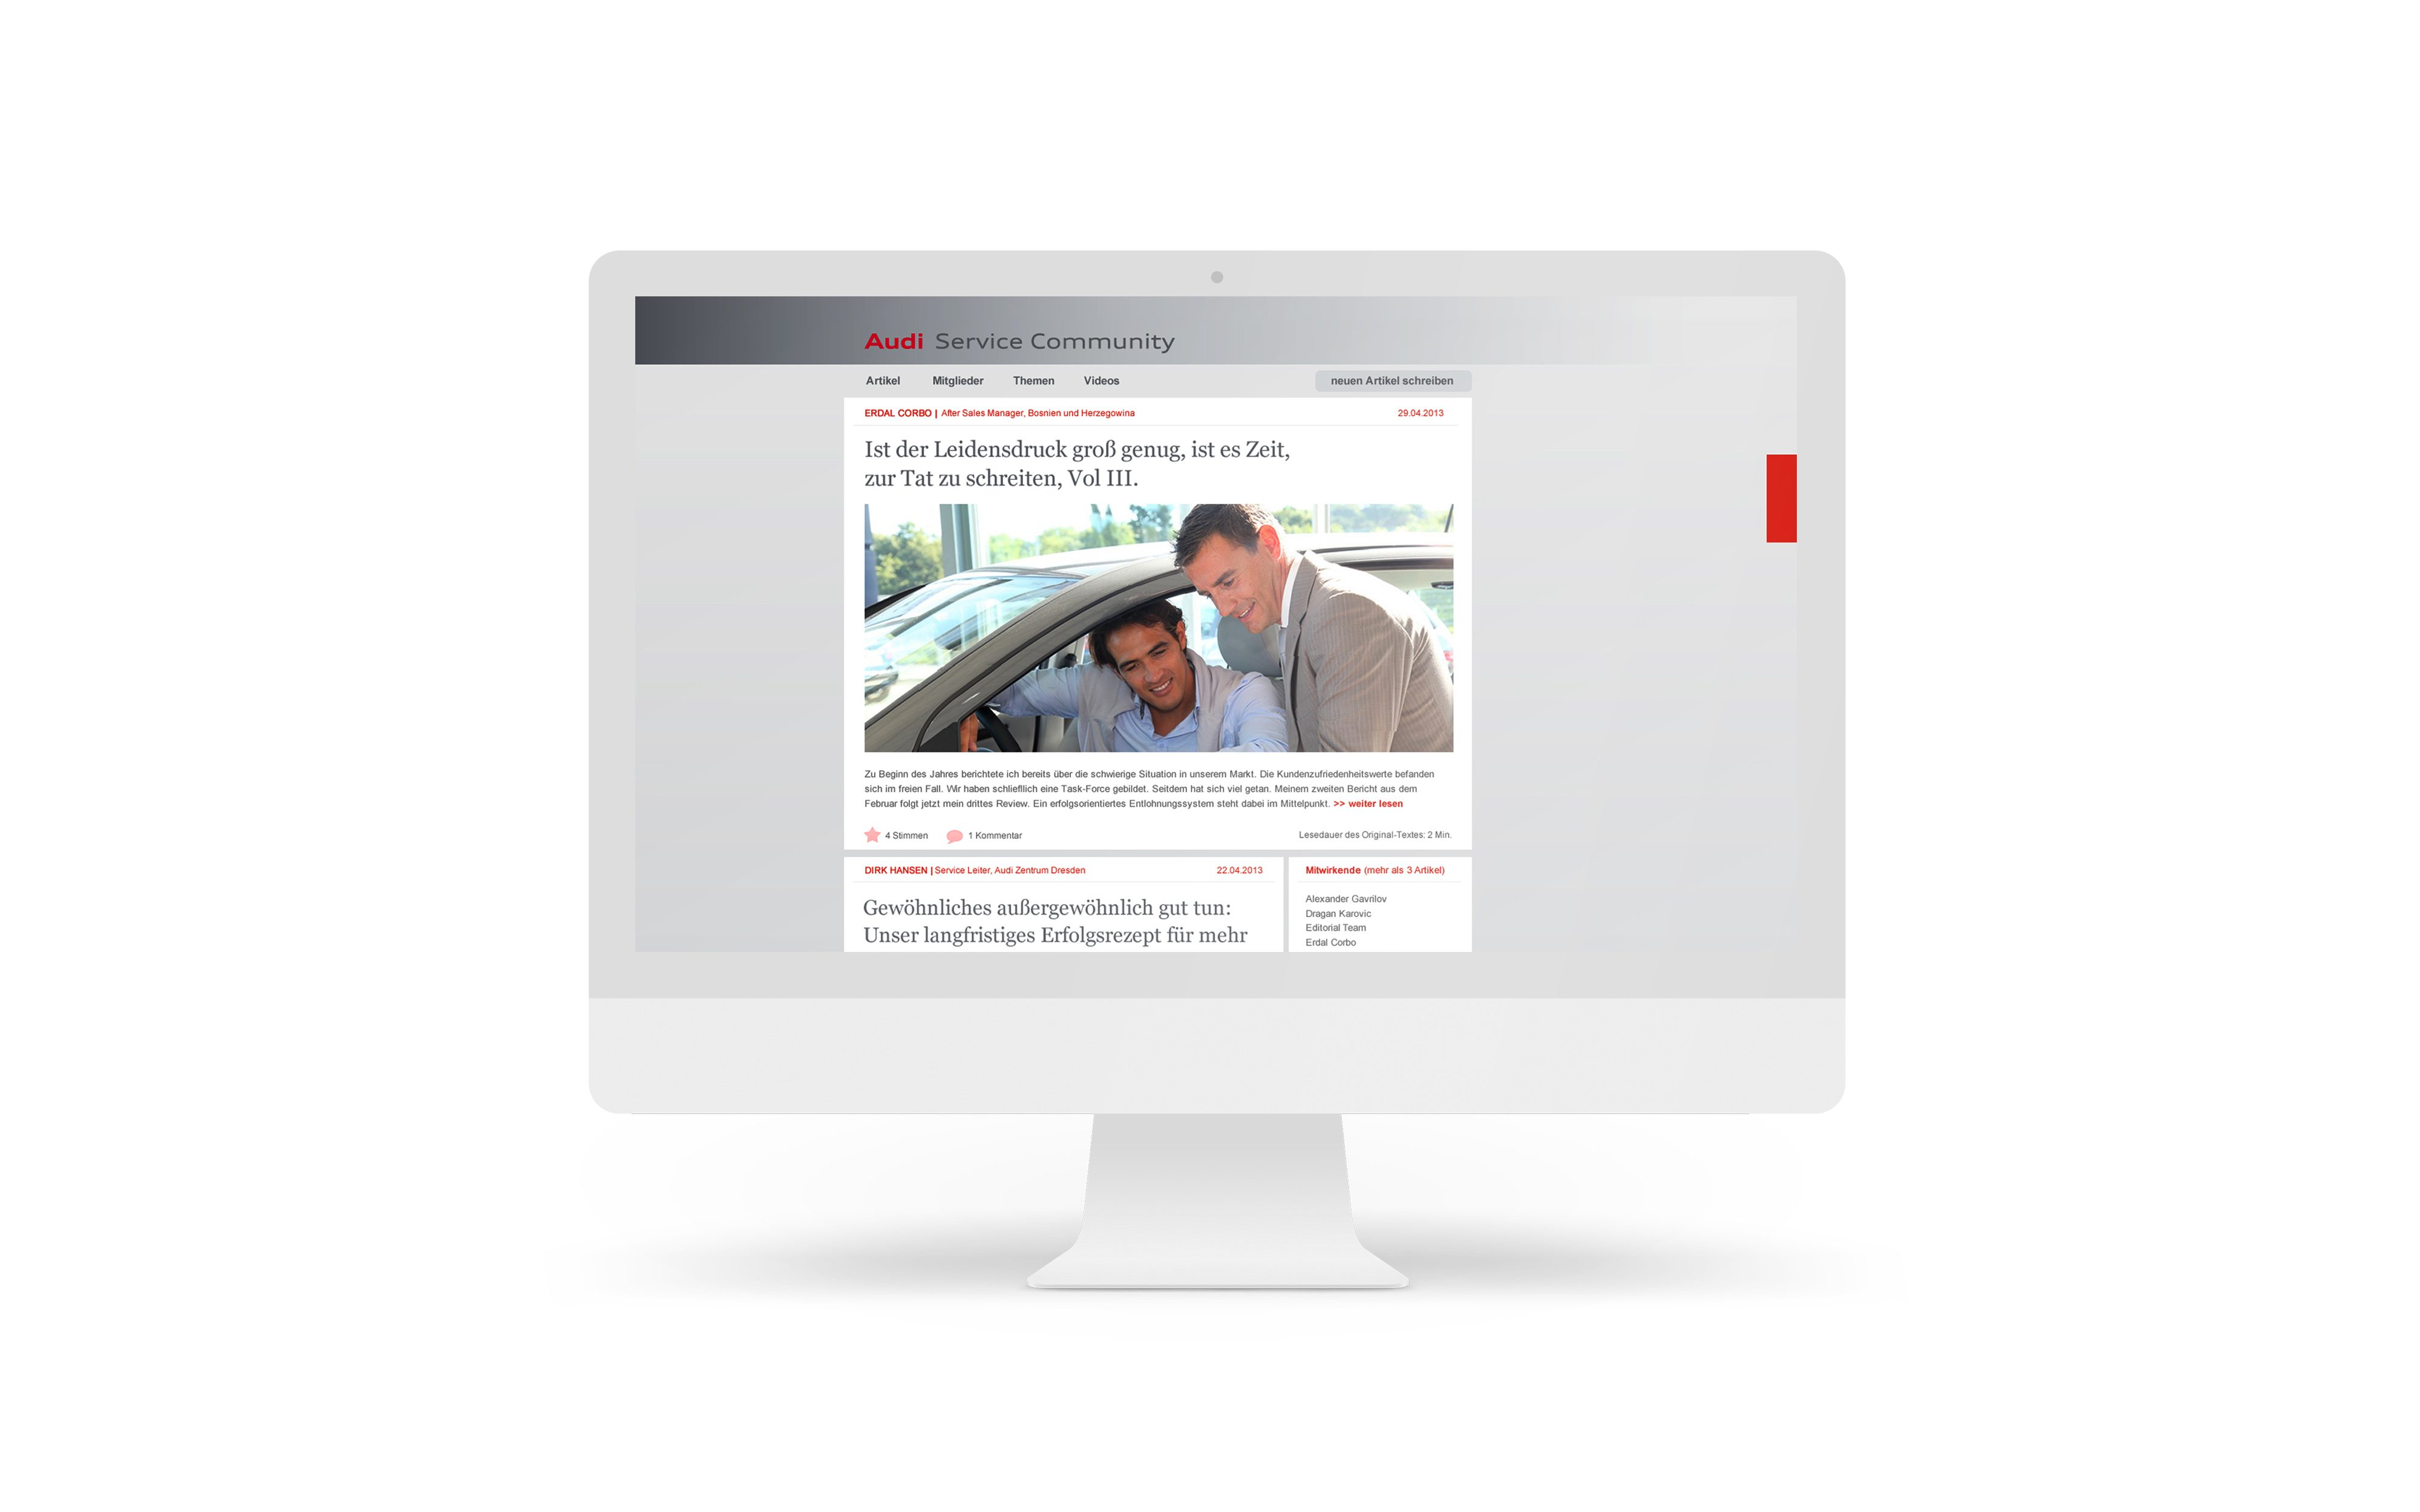 GRACO-Berlin-Audi-Innovation-Corporate-Blog-2